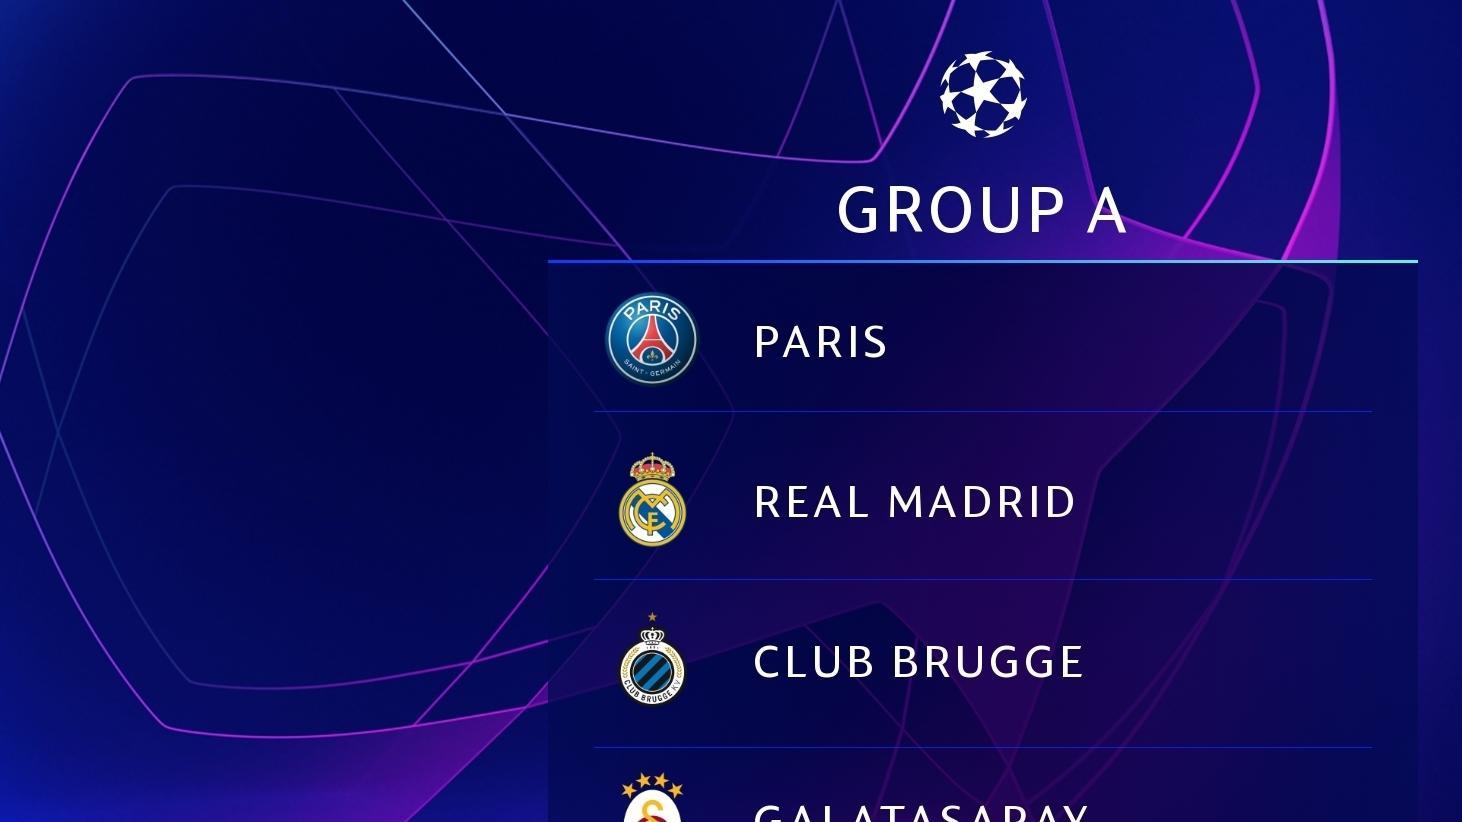 group a the lowdown uefa champions league uefa com uefa champions league